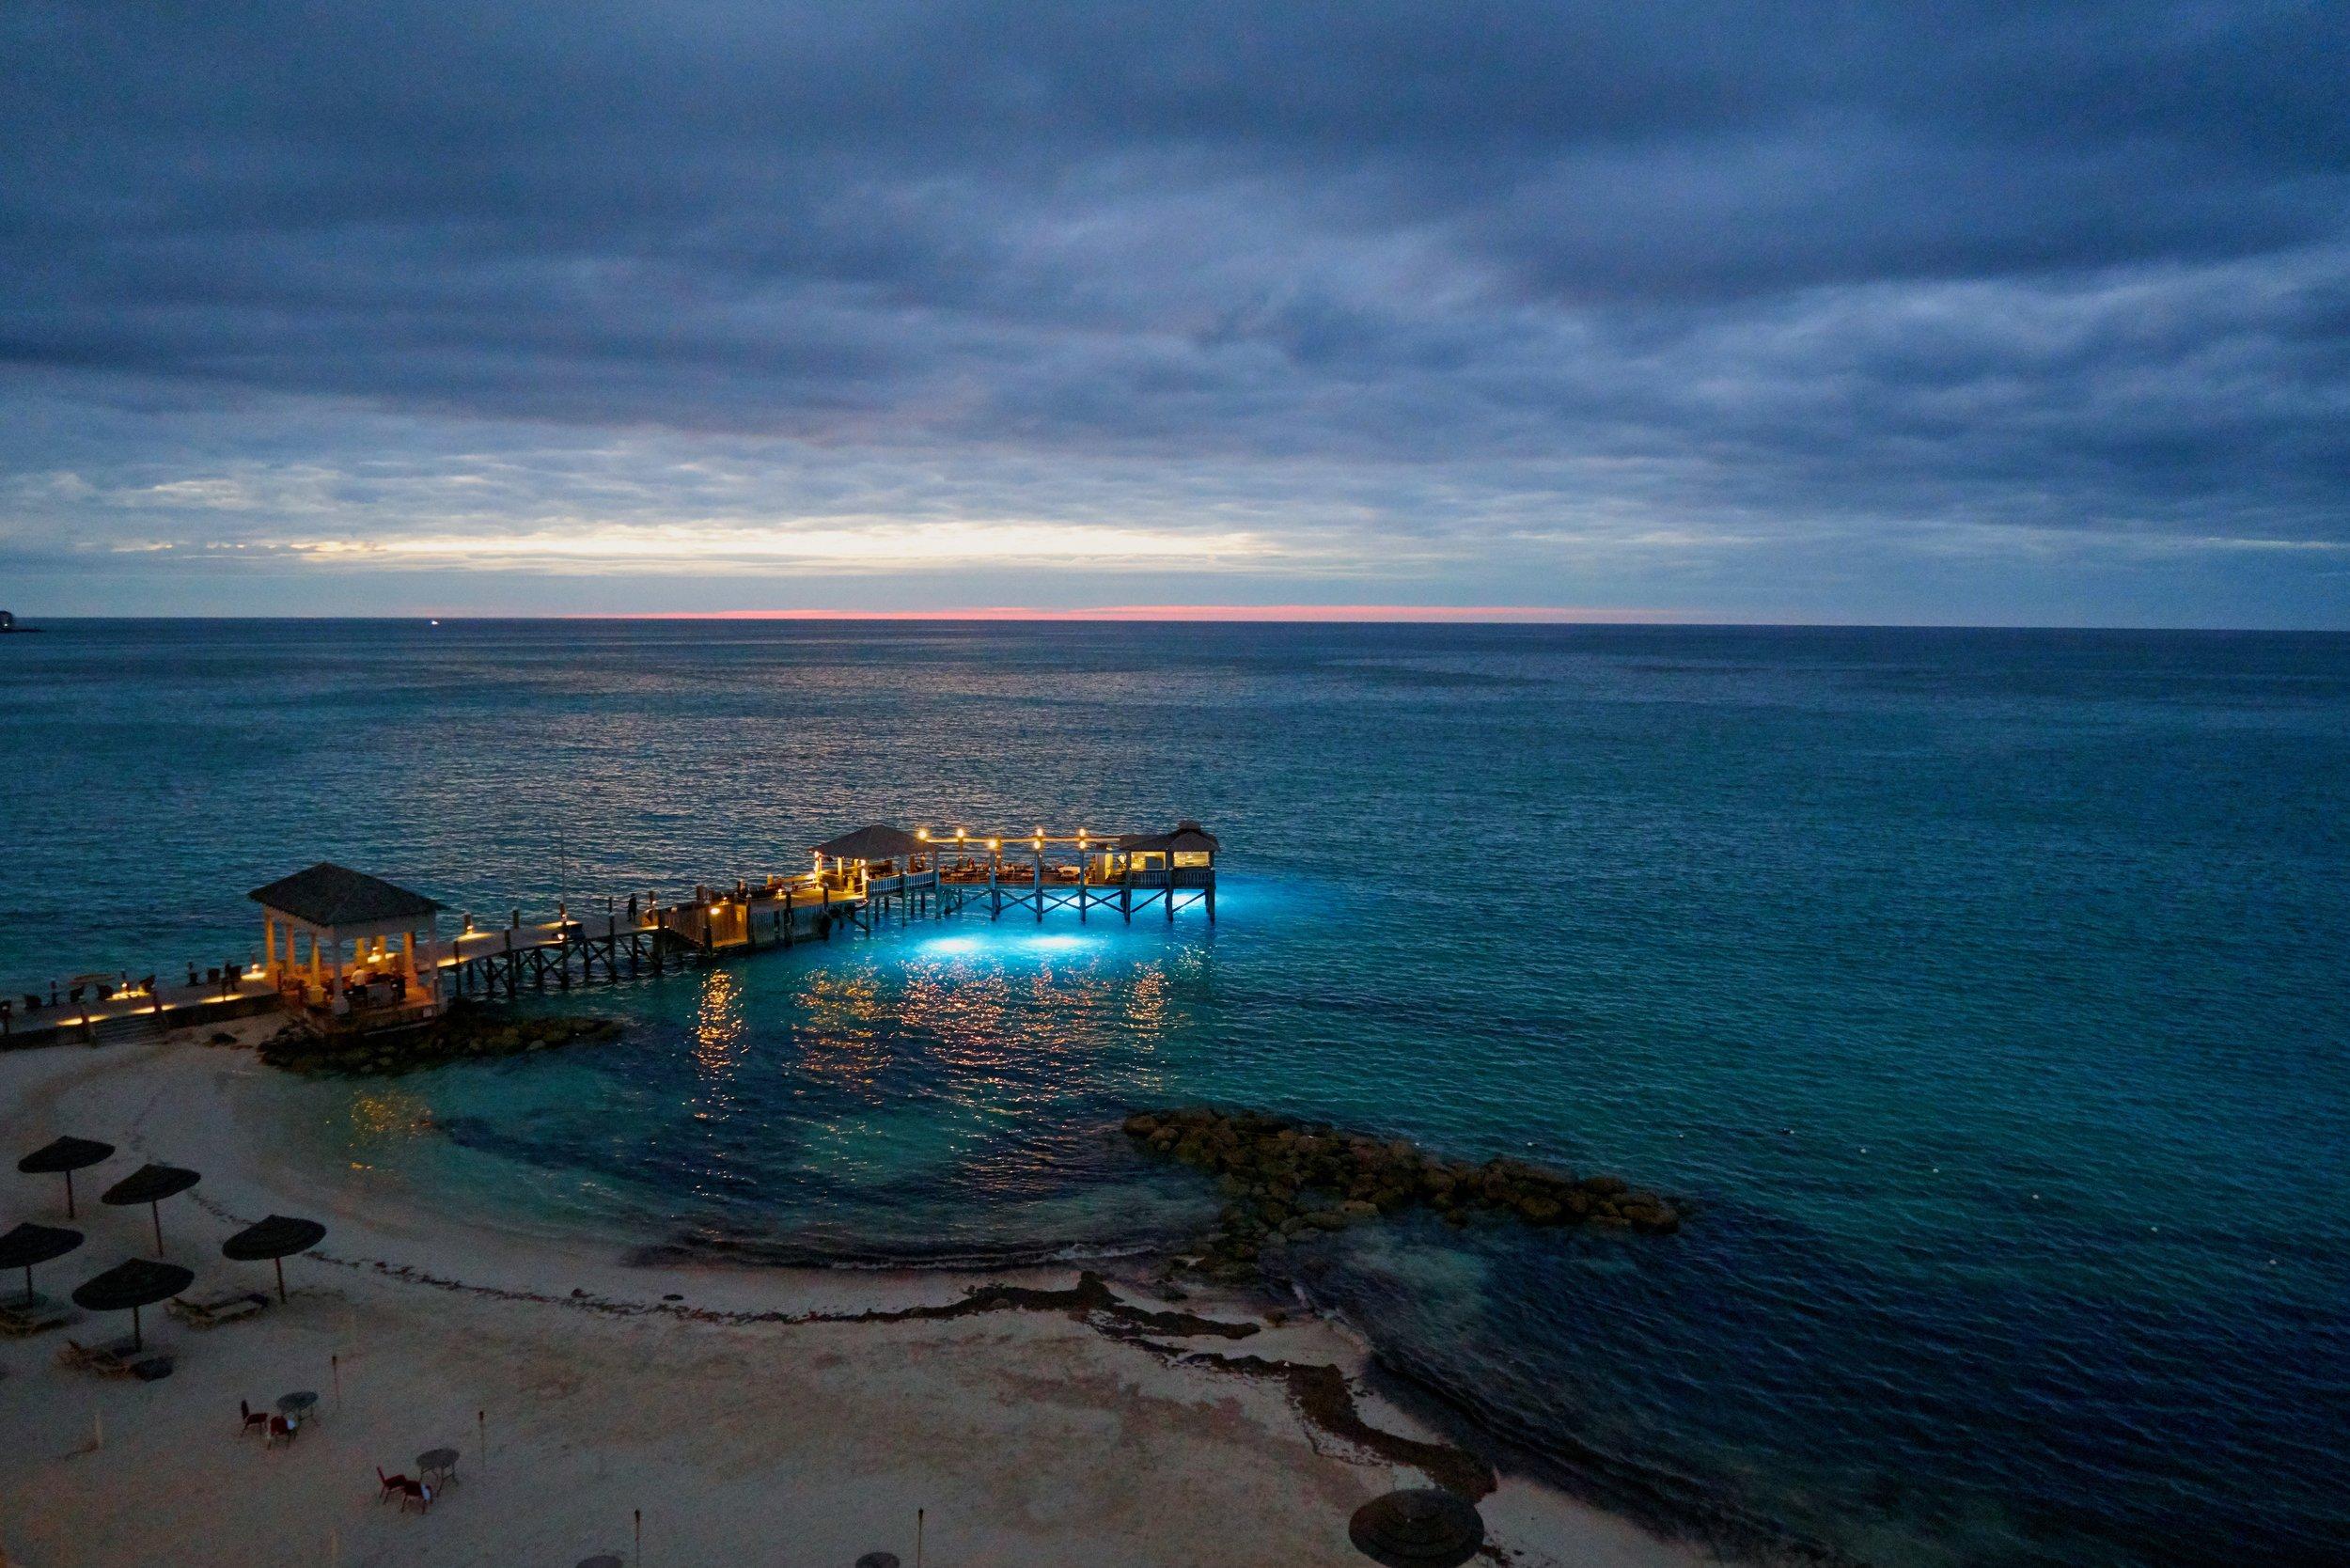 bahamas-beach-clouds-877962 (1).jpg